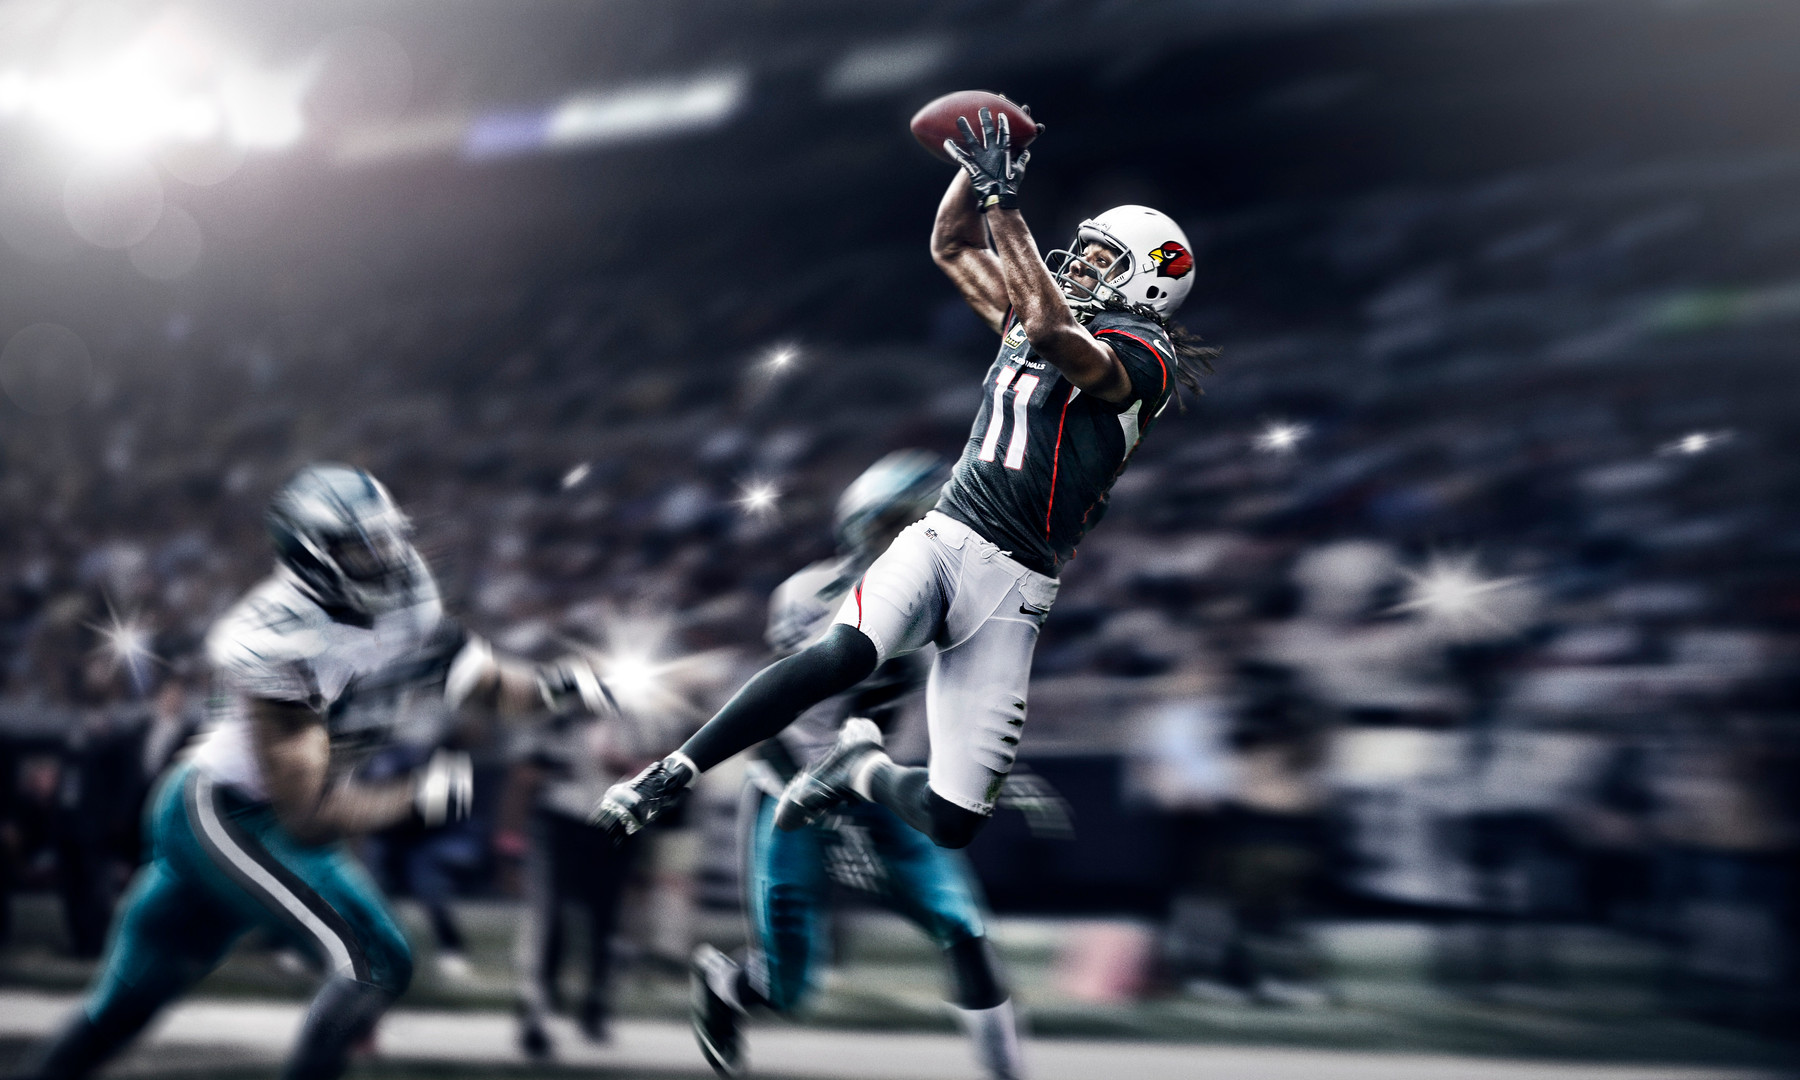 SU13_AT_FITZGERALD_NFL_CARDINALS_INGAME_